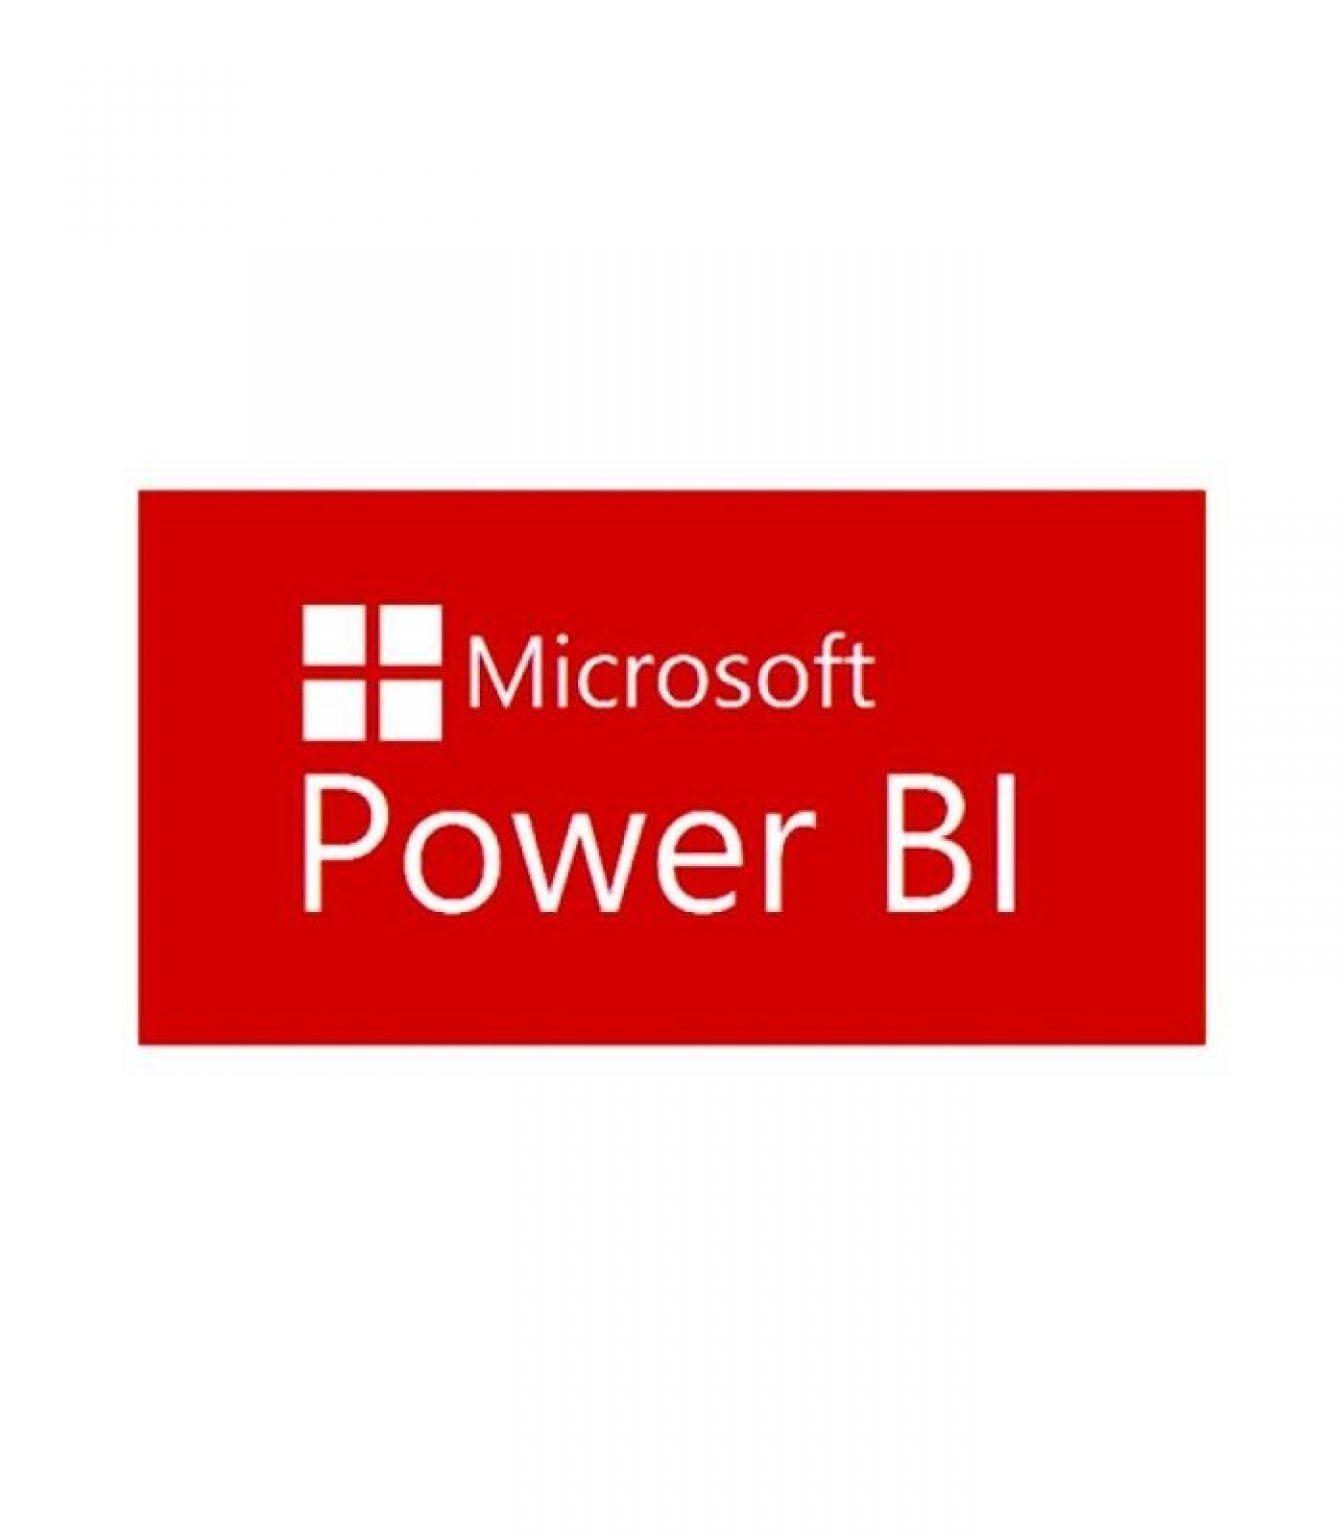 MICROSOFT - [Power BI Pro Open]PwrBIProOpen ShrdSvr SubsVL OLP NL Annual Gov Qlfd[Pemerintah]